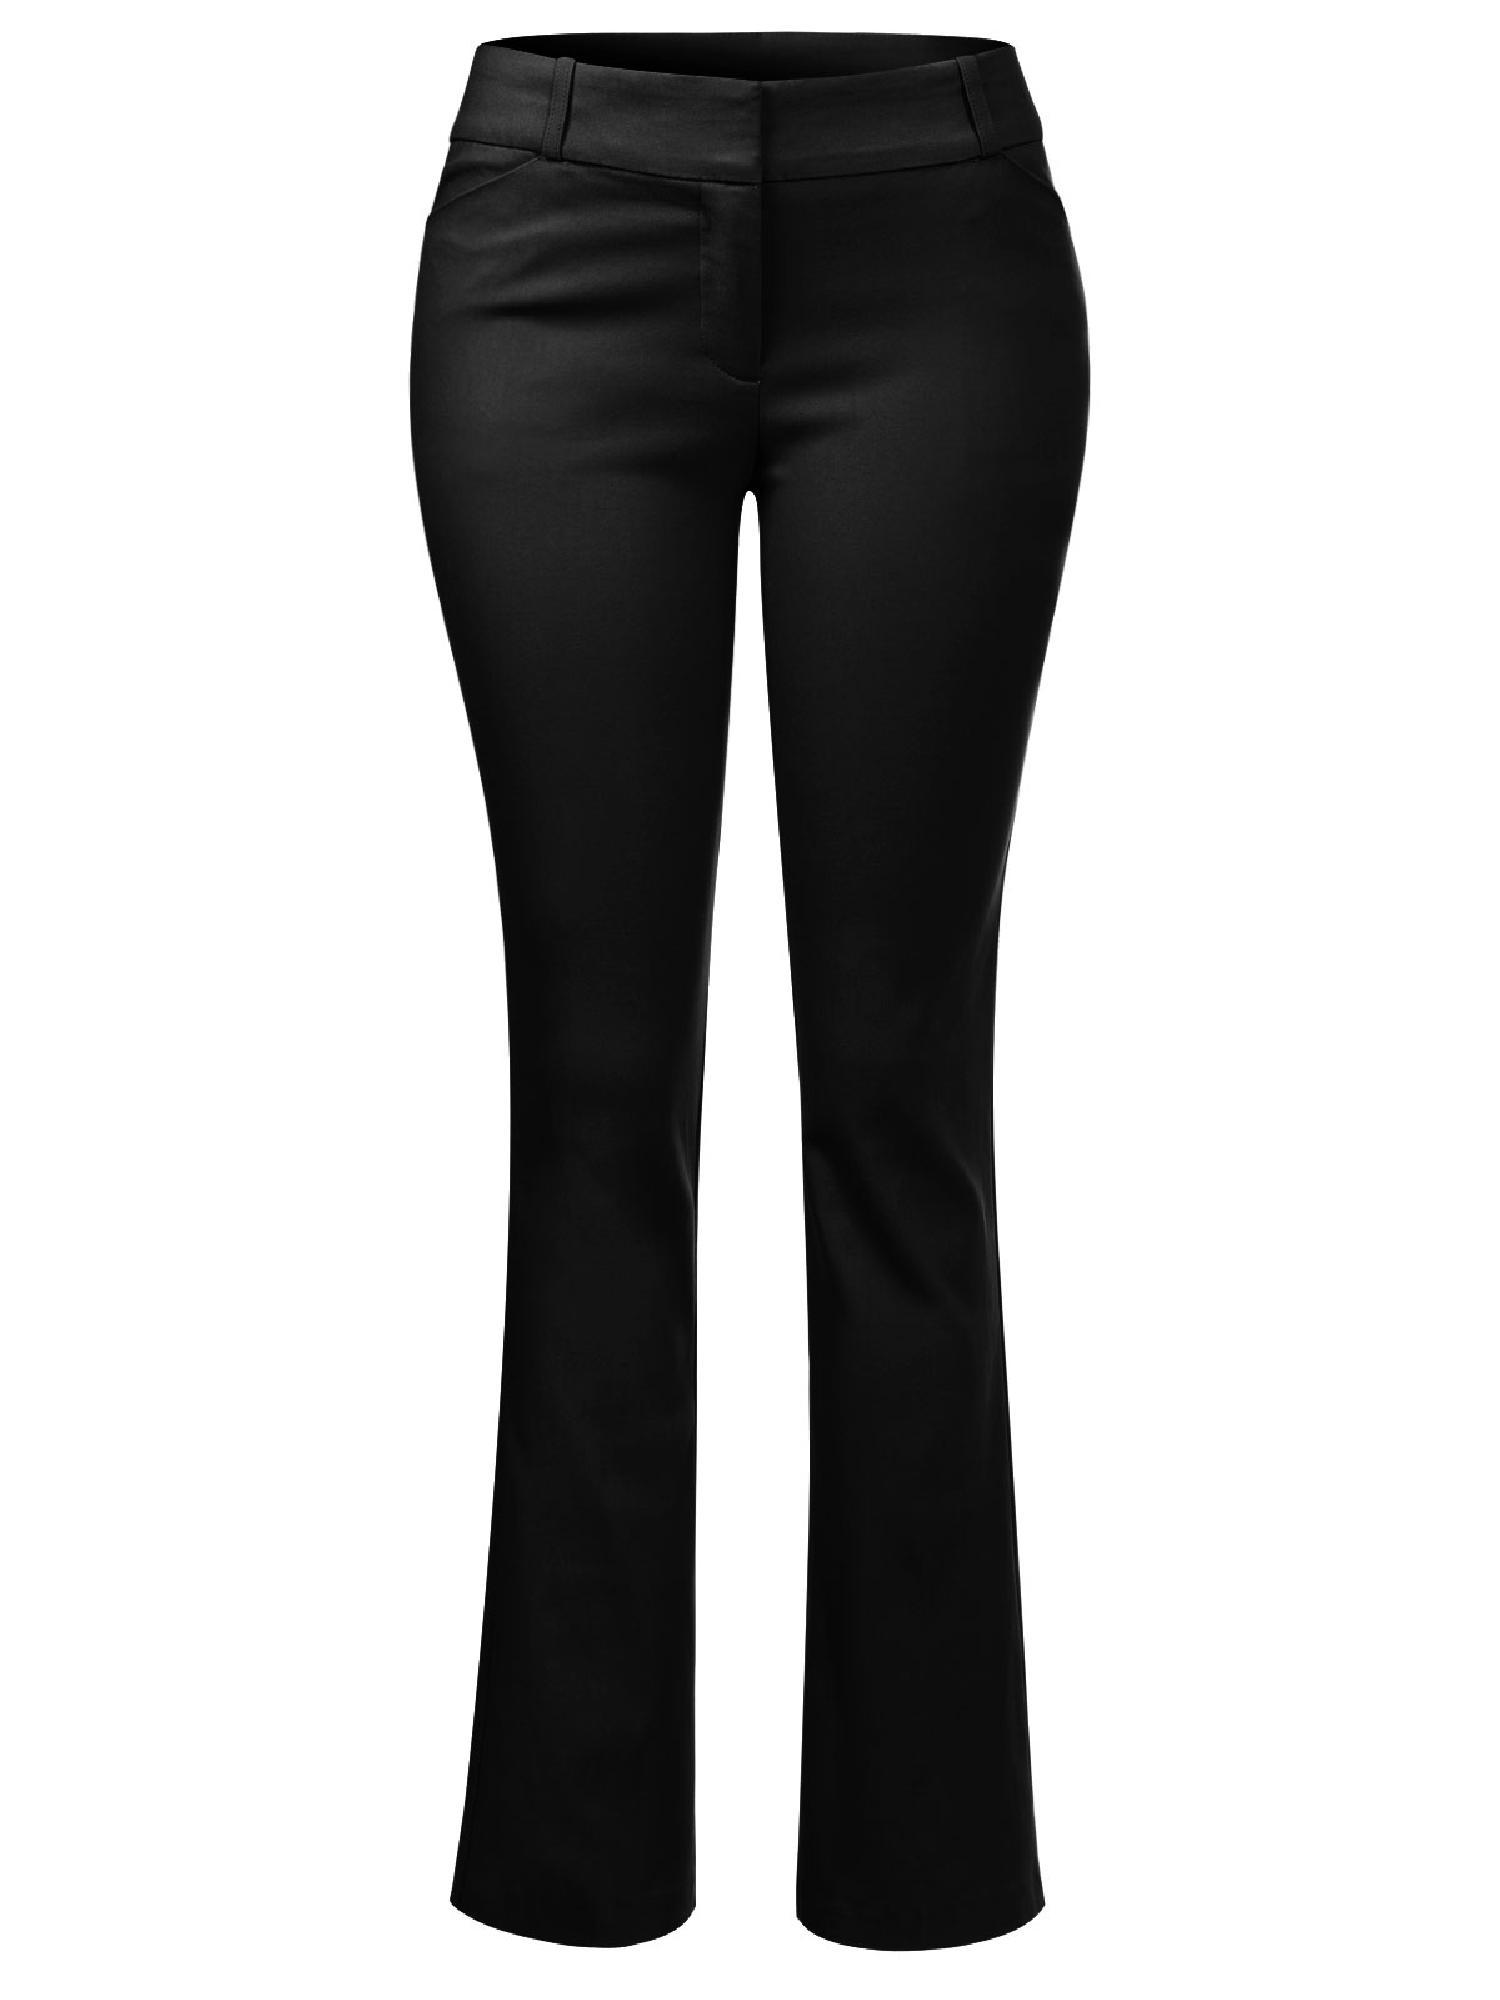 6e8eaae782d Made by Olivia - Made by Olivia Women's High Waist Comfy Stretchy Bootcut  Trouser Pants Black 3XL - Walmart.com